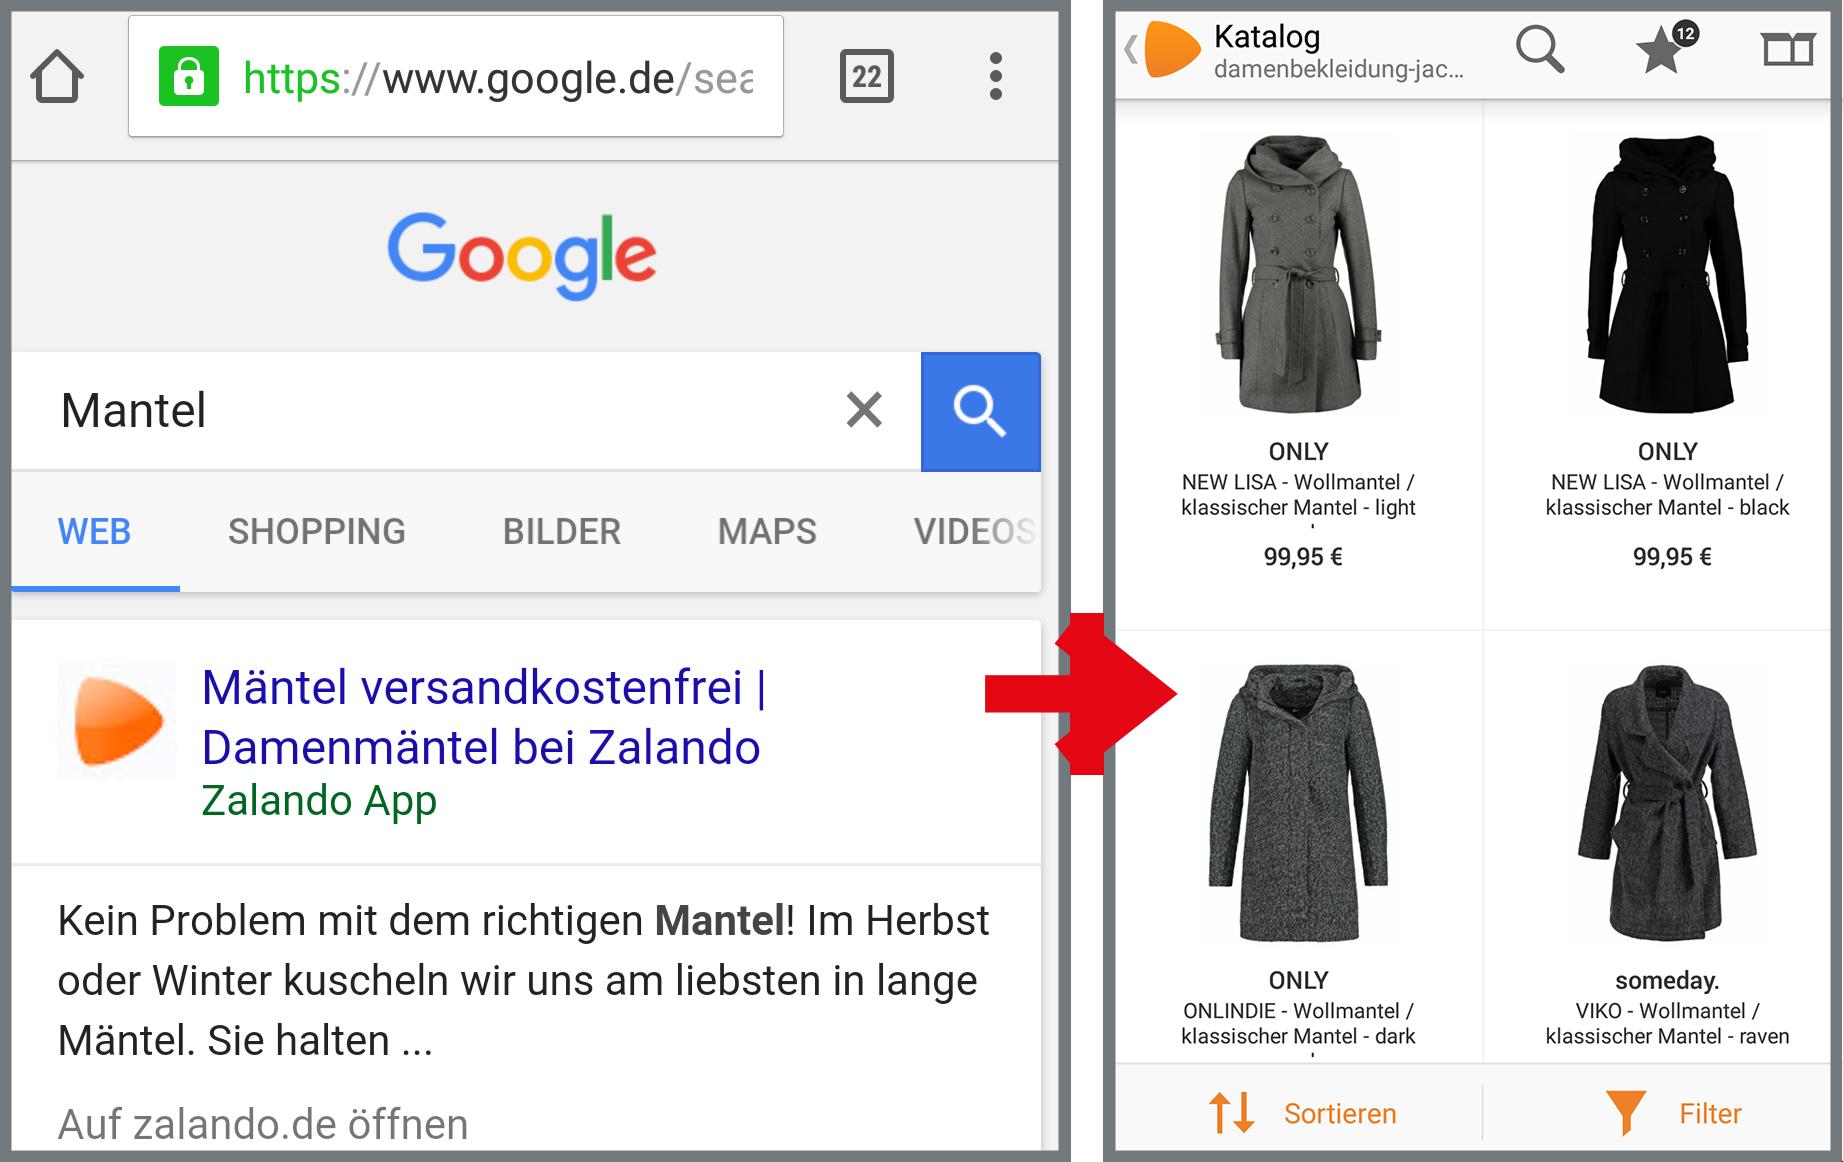 Zalando2 meilleure indexation des applications de classement Google